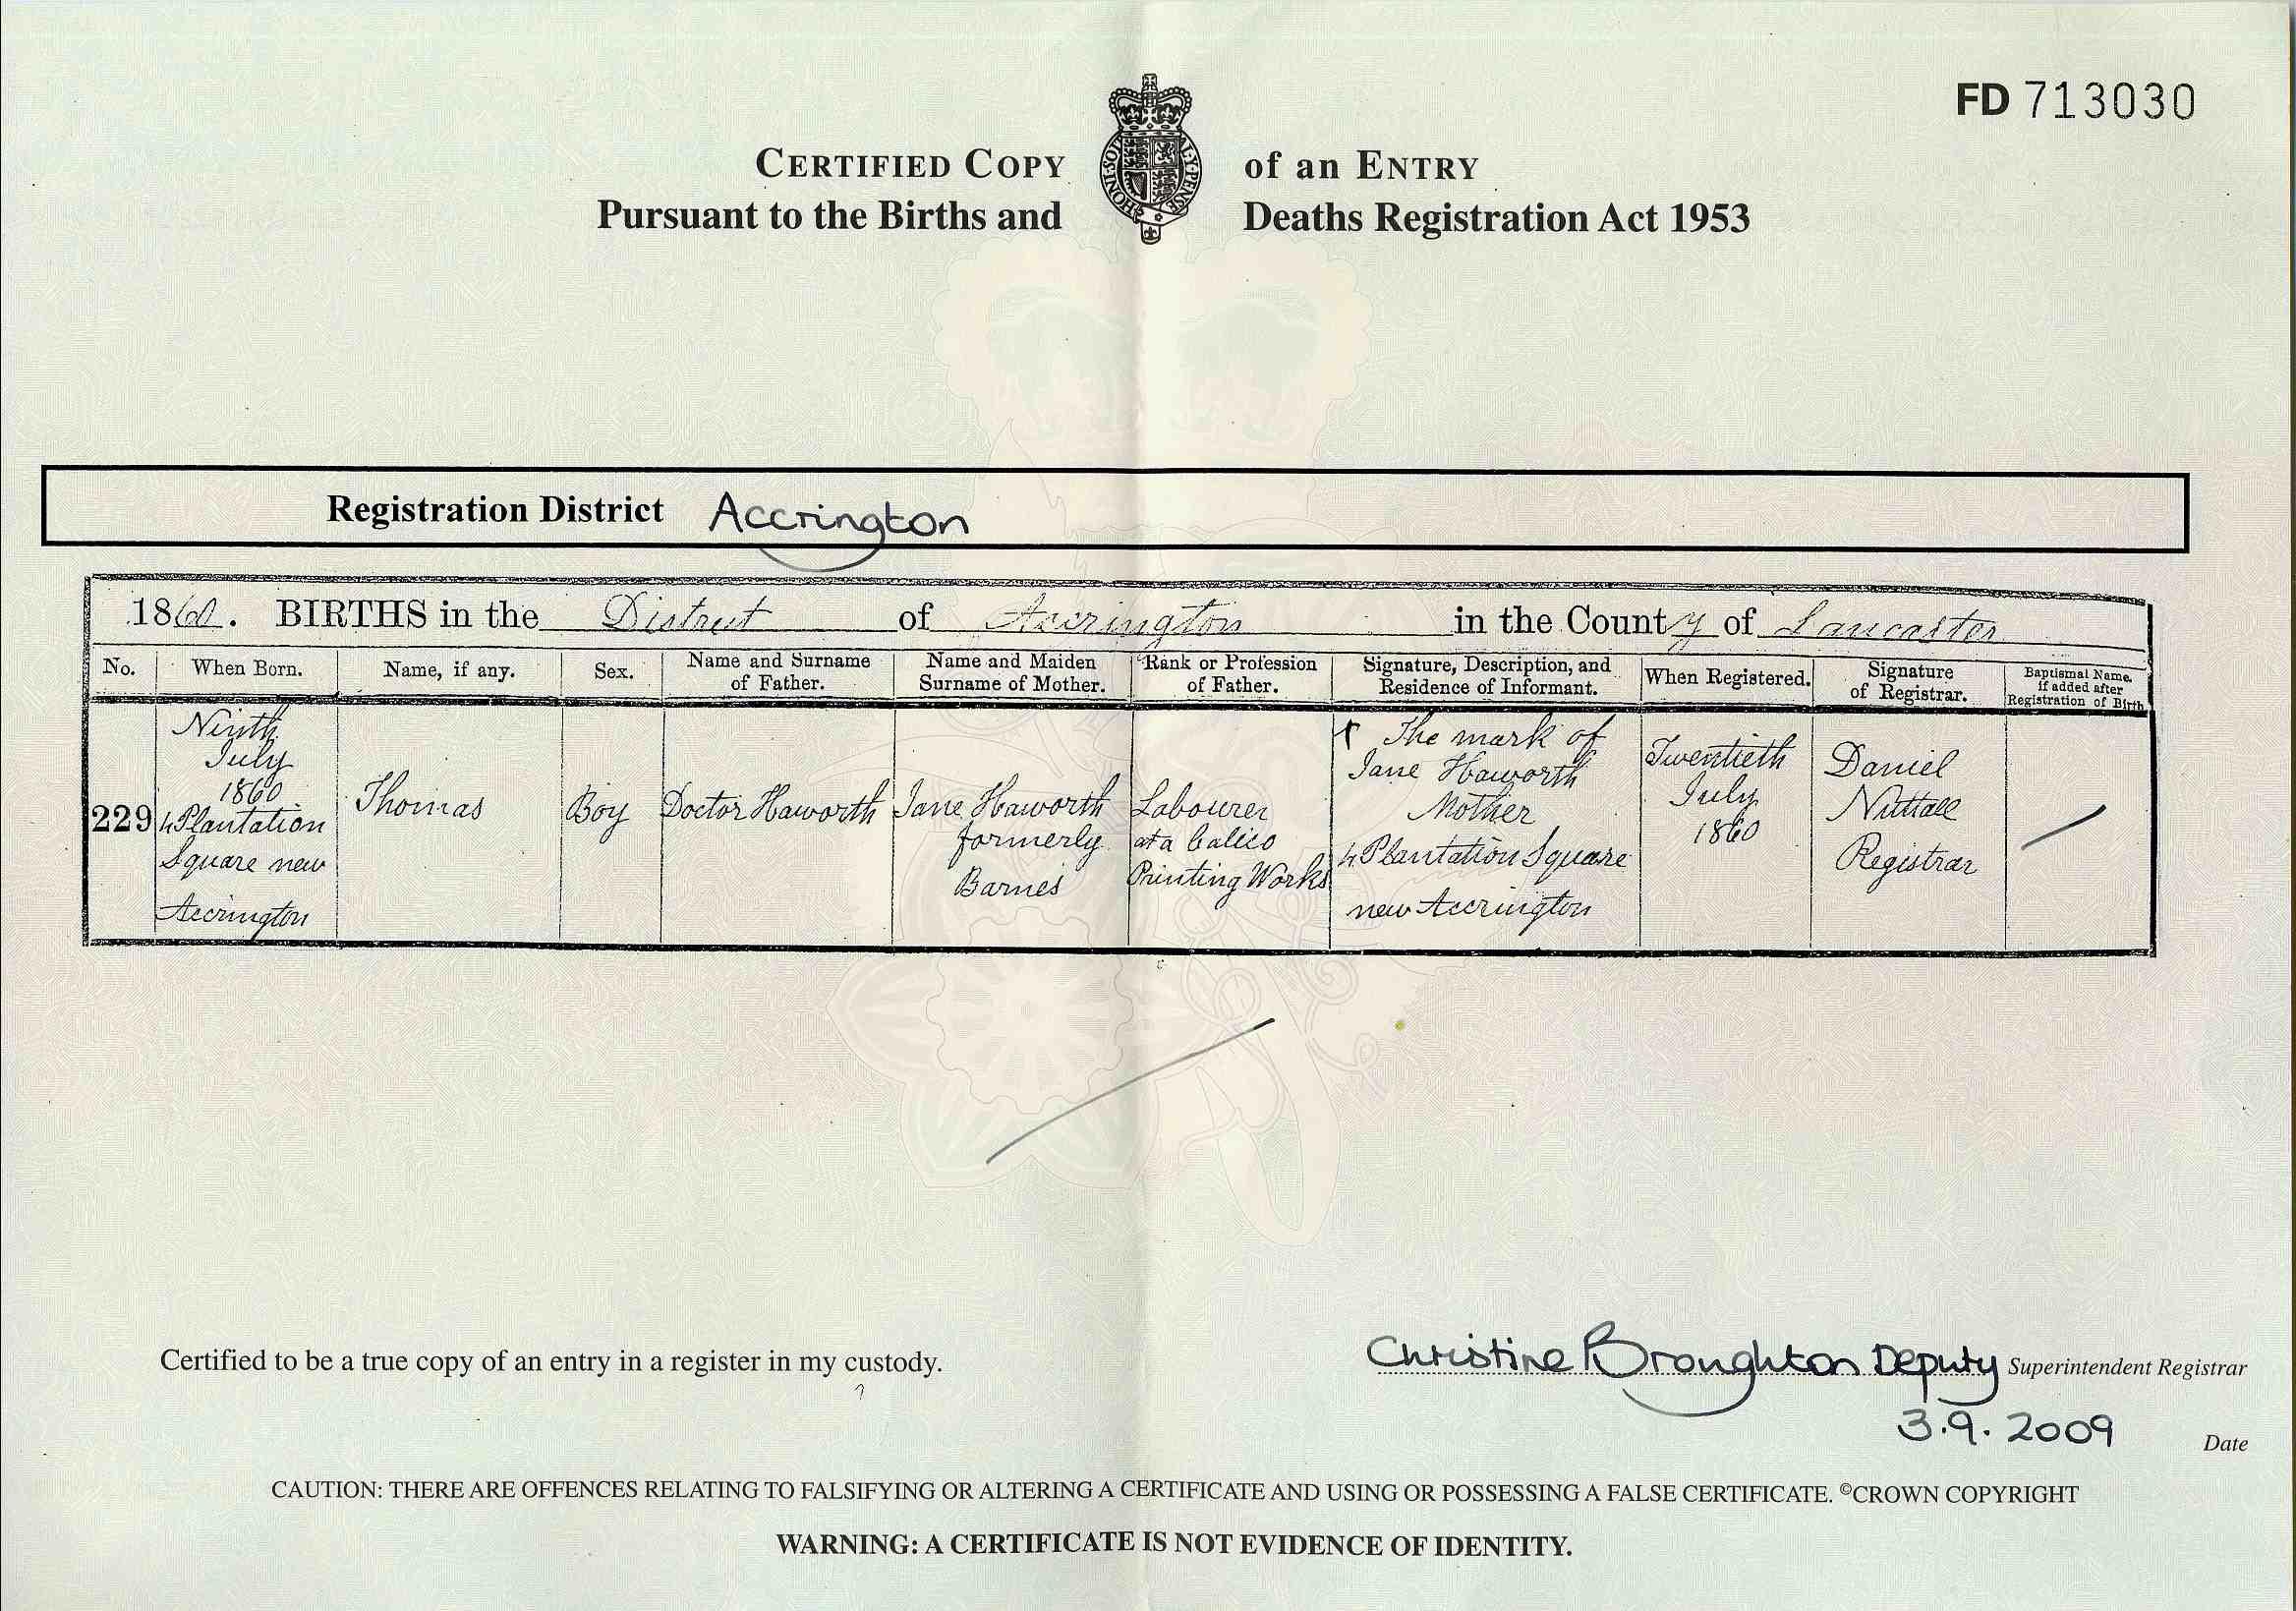 British birth certificate